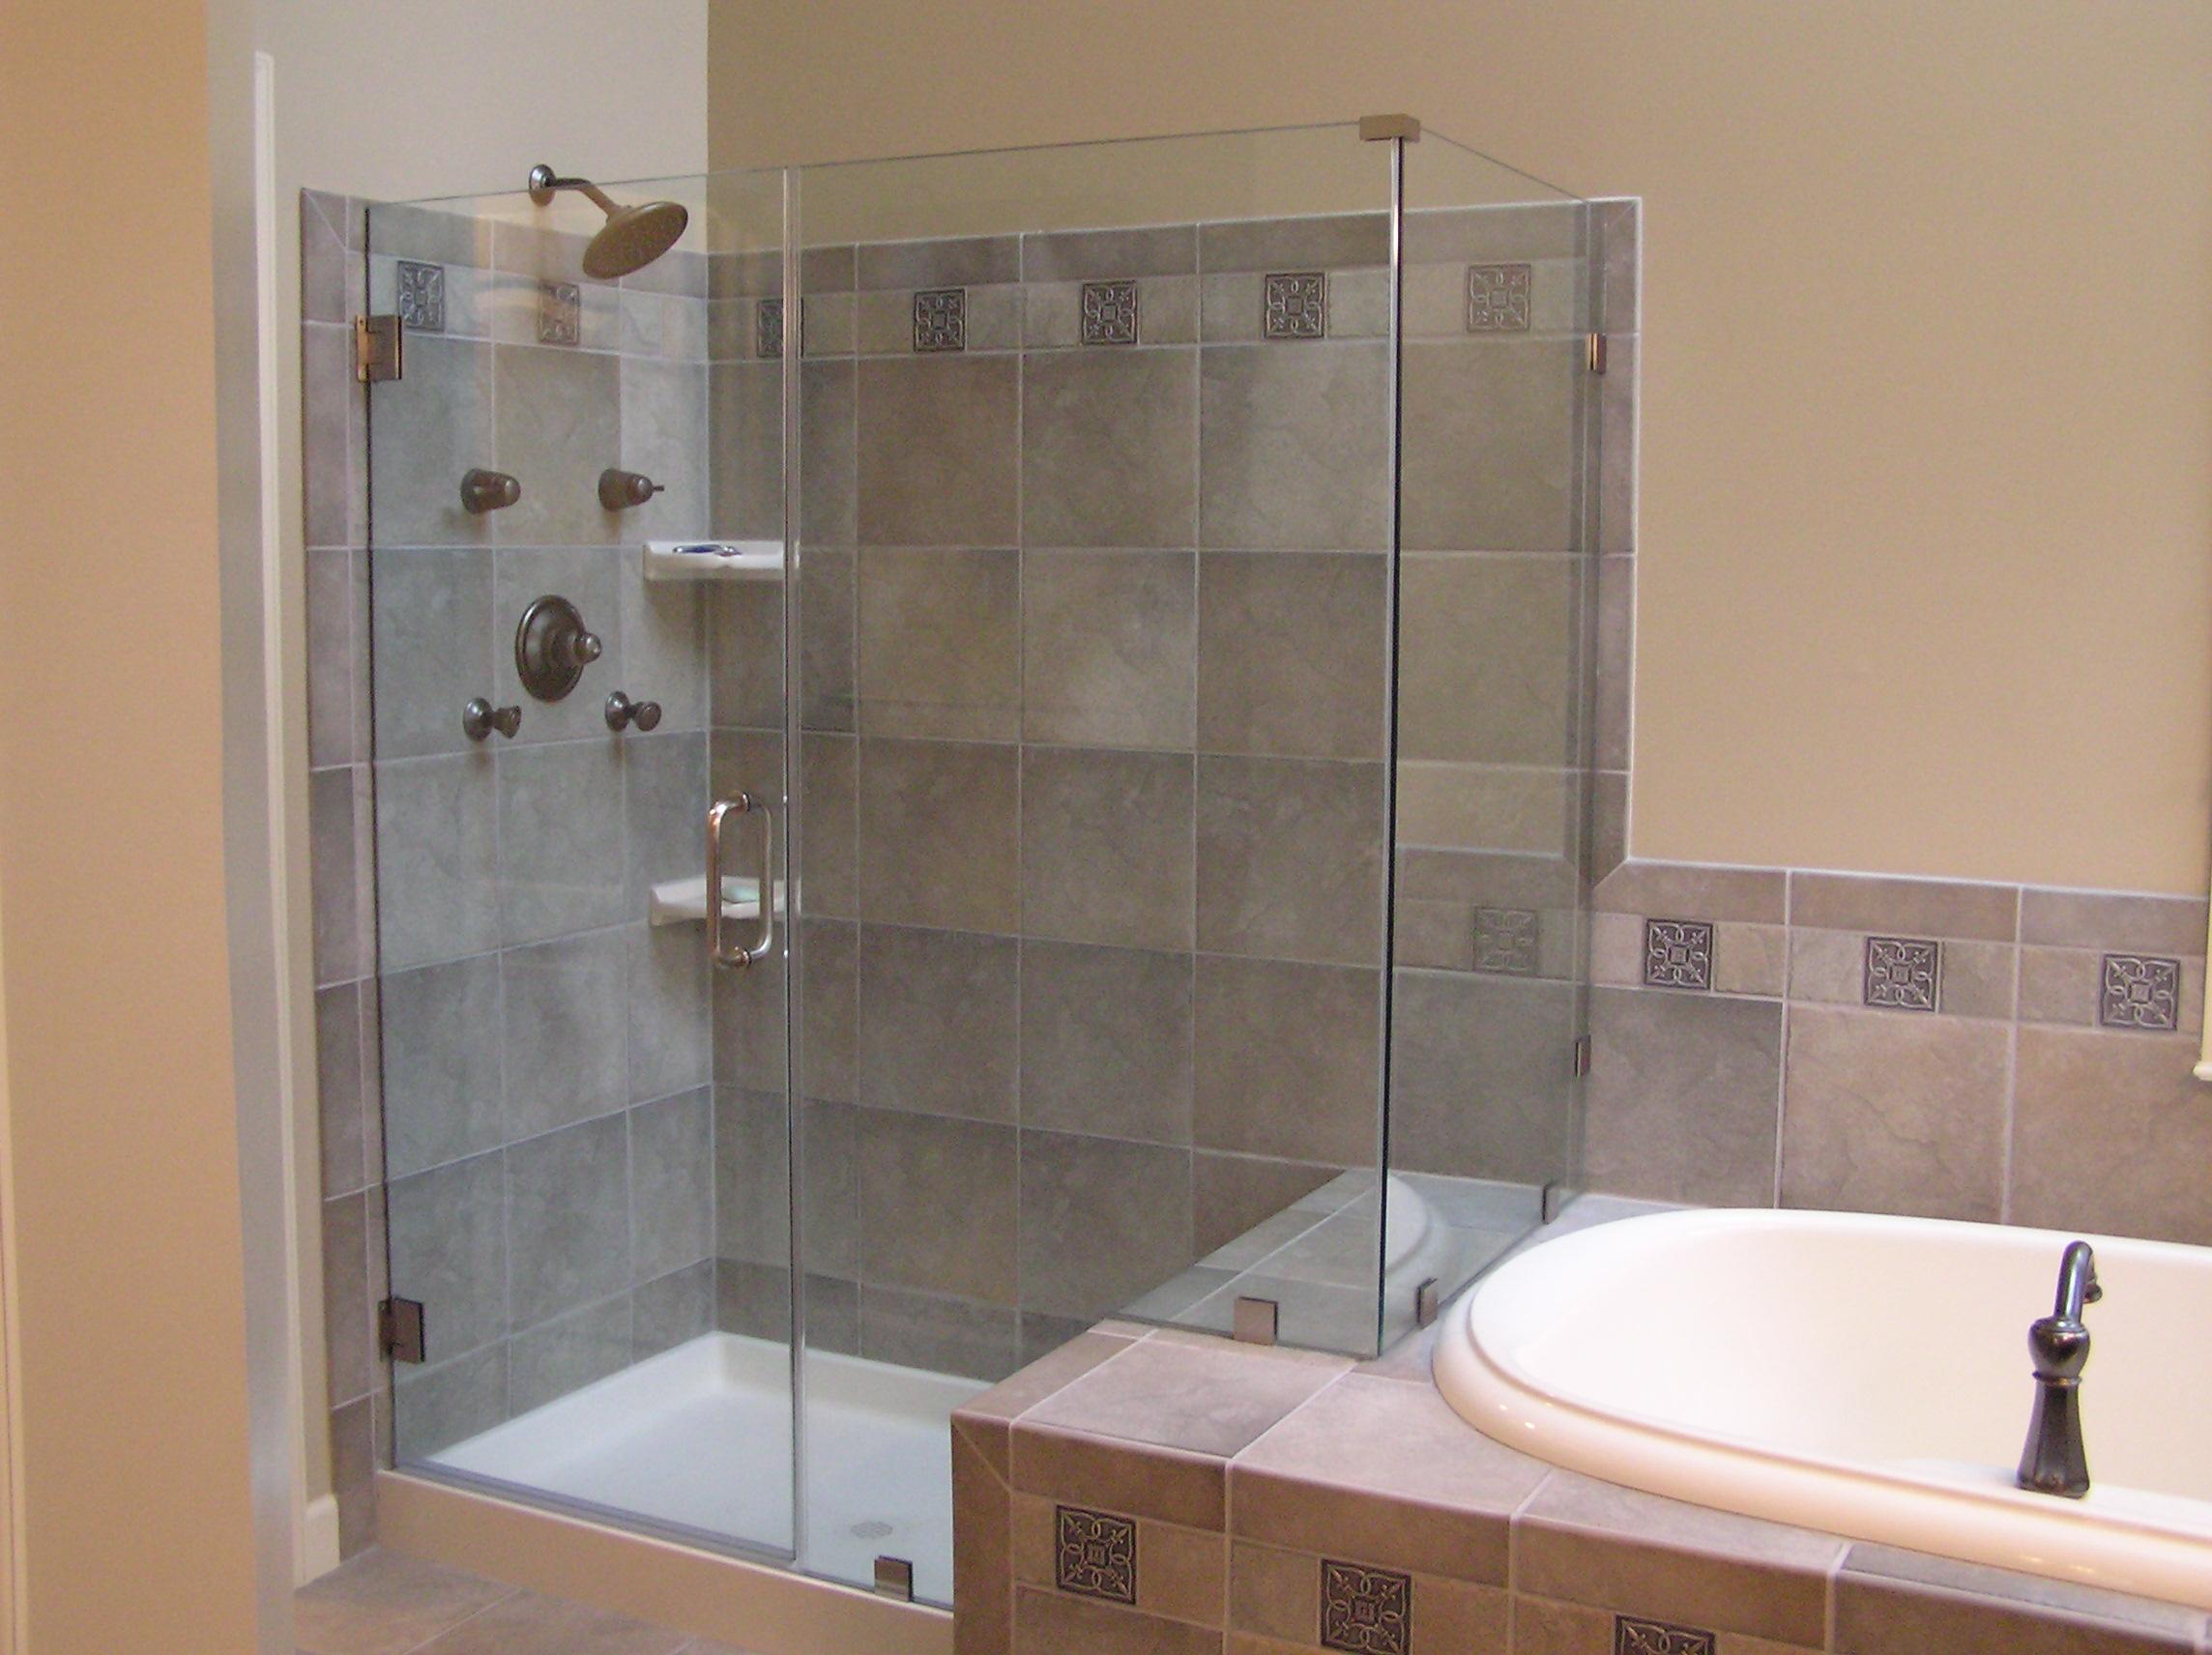 Hgtv bathroom remodels Photo - 1